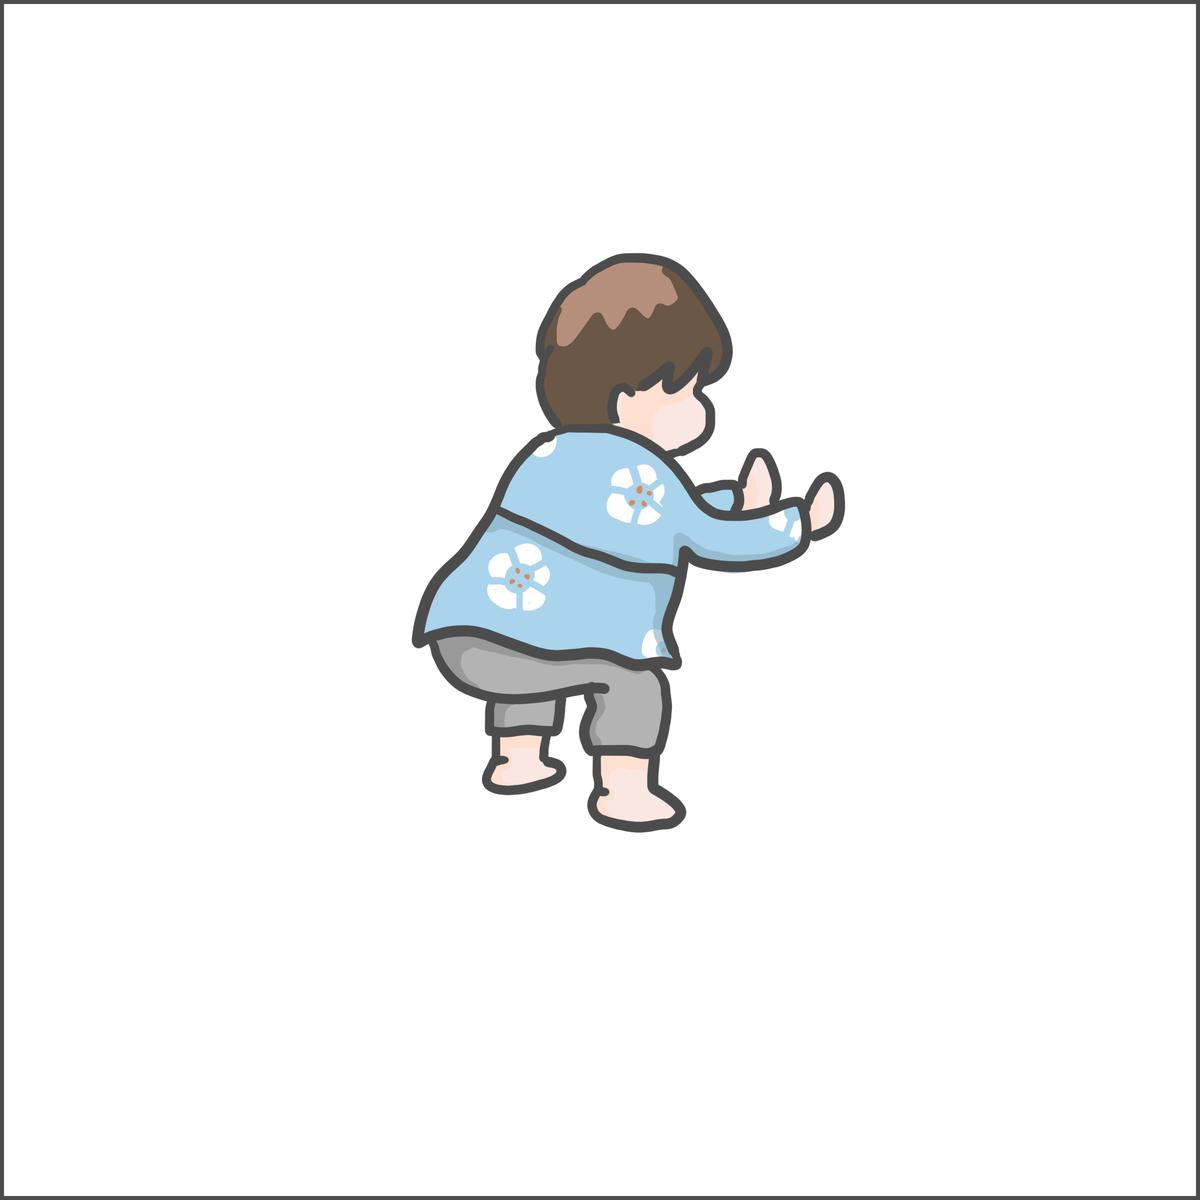 f:id:ika_yoshi:20201023225748j:plain